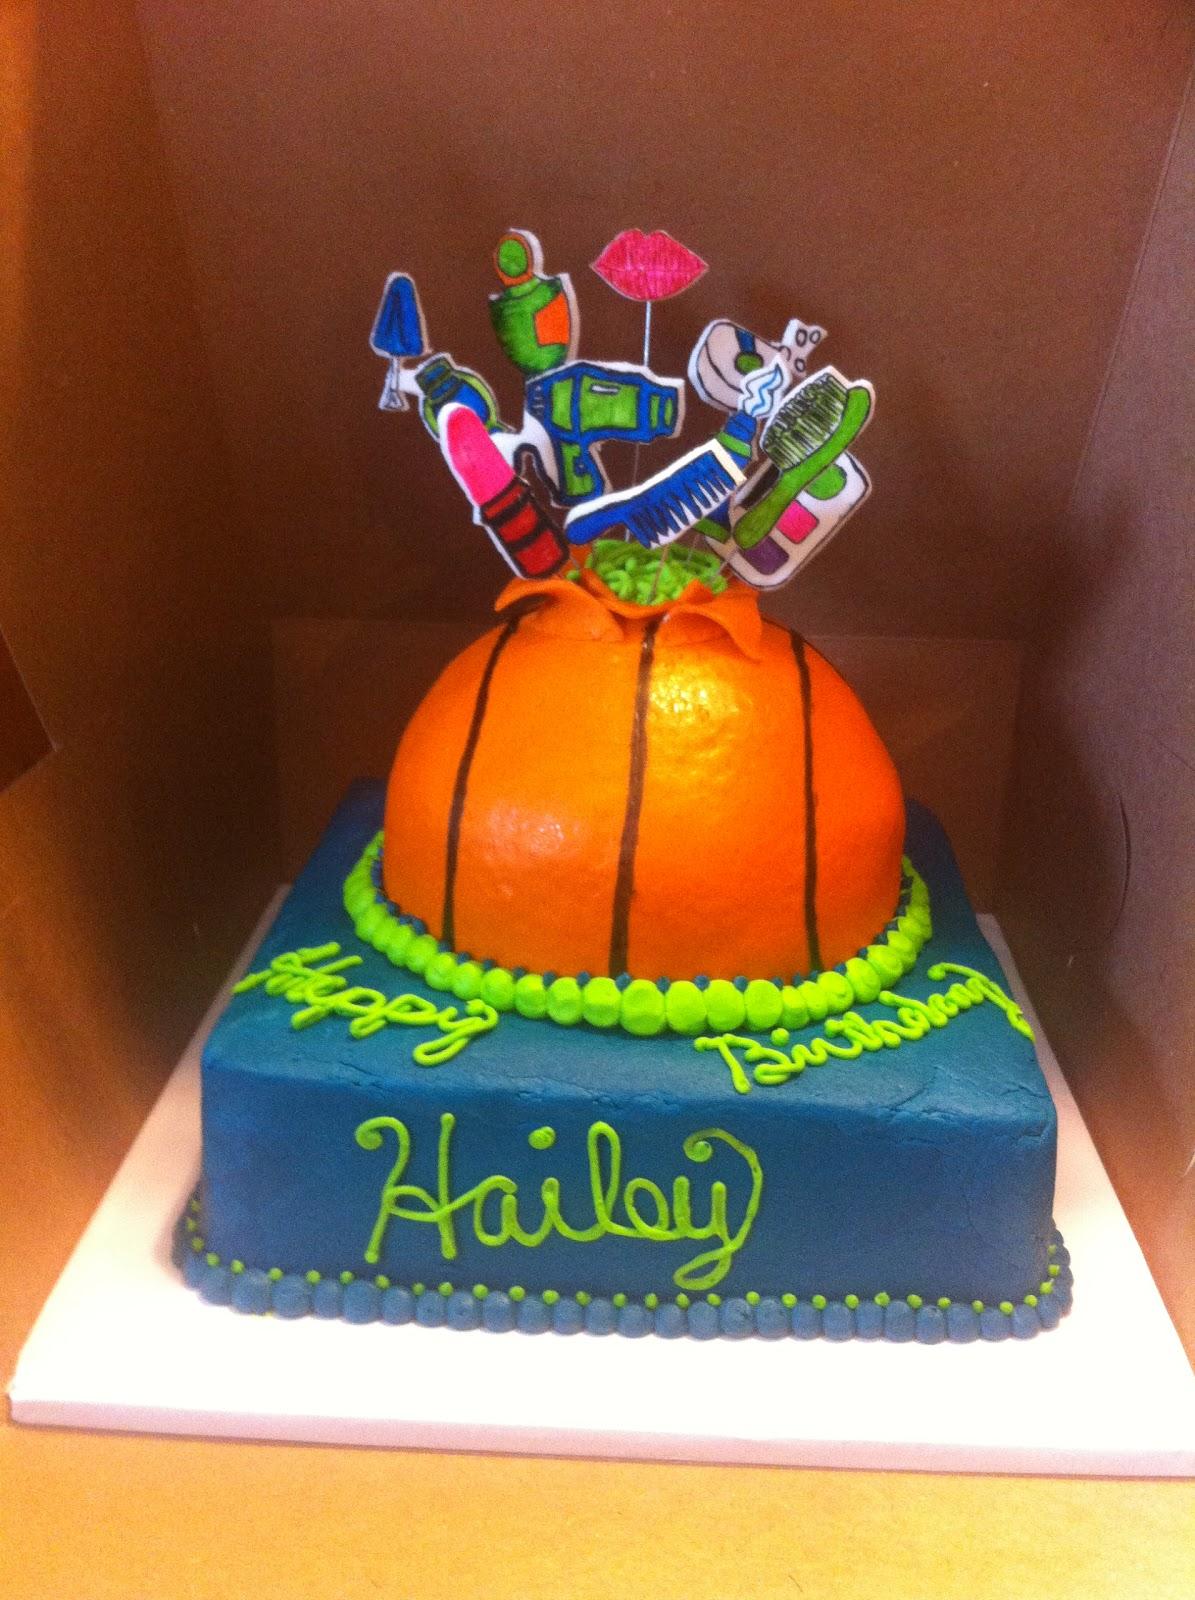 Cakecreated July 2012